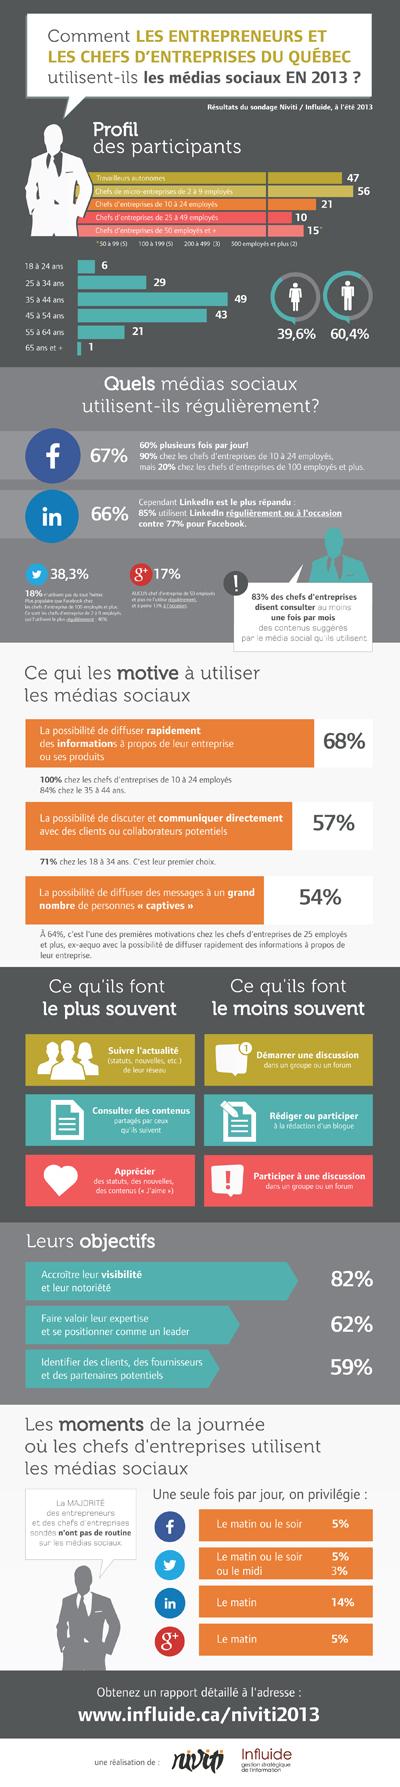 Infographie-Utilisation-medias-sociaux-Niviti-Influide-Facebook